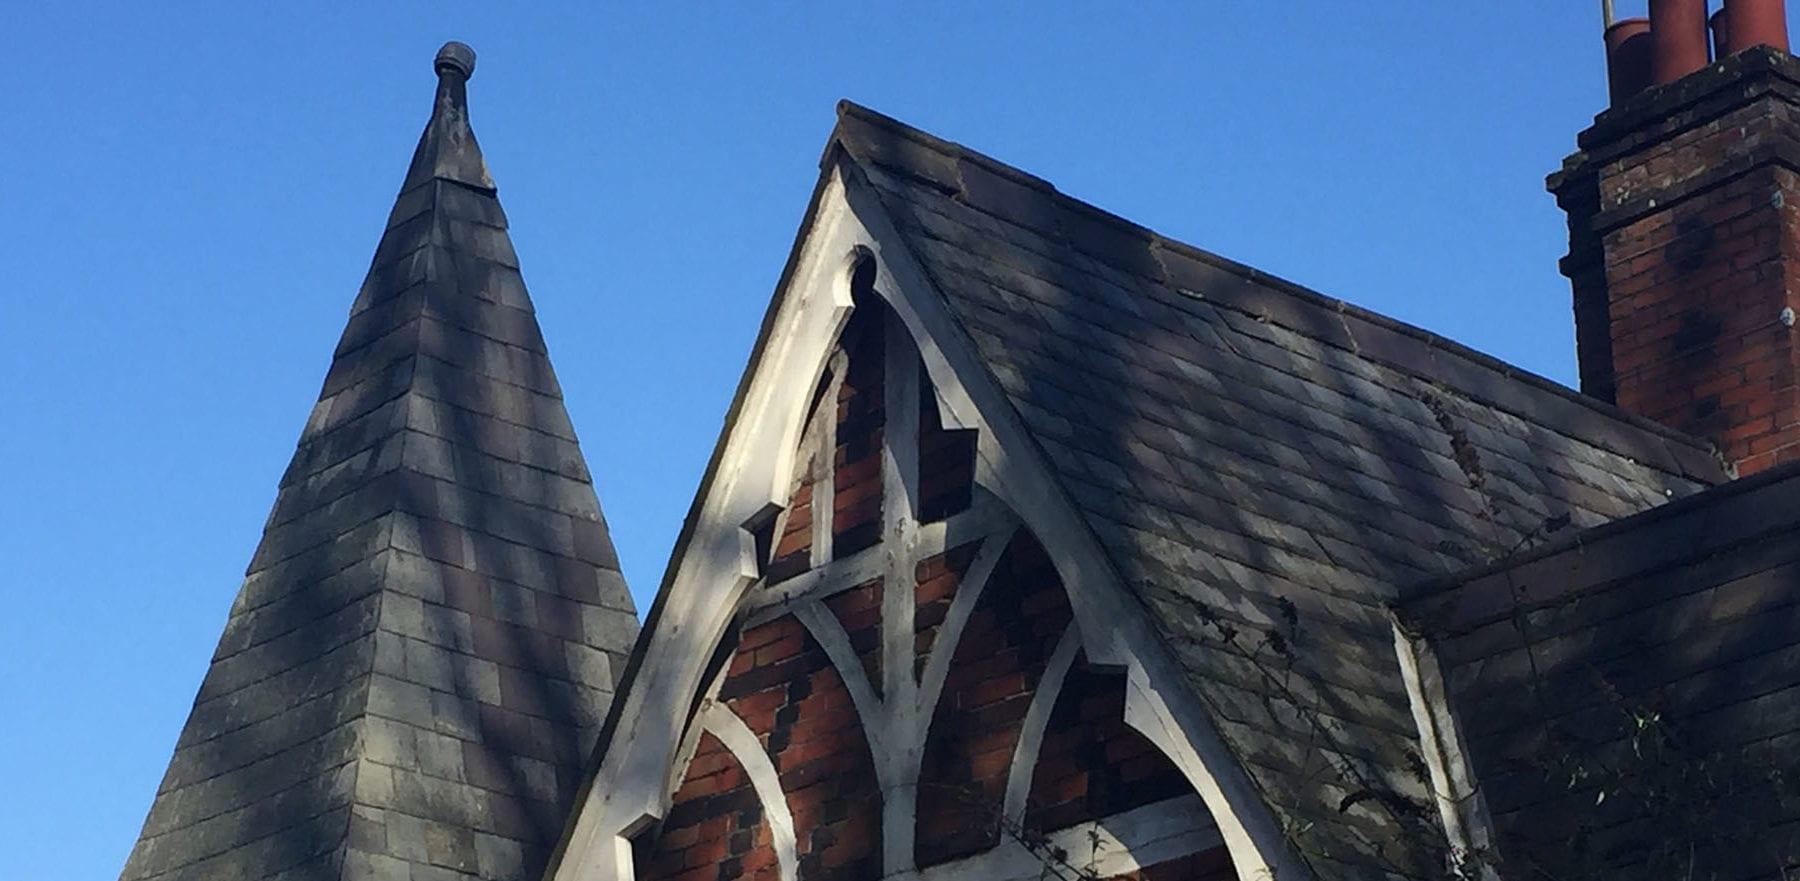 Lifestiles - Welsh Natural Slate Roof Tiles - Various, England 6